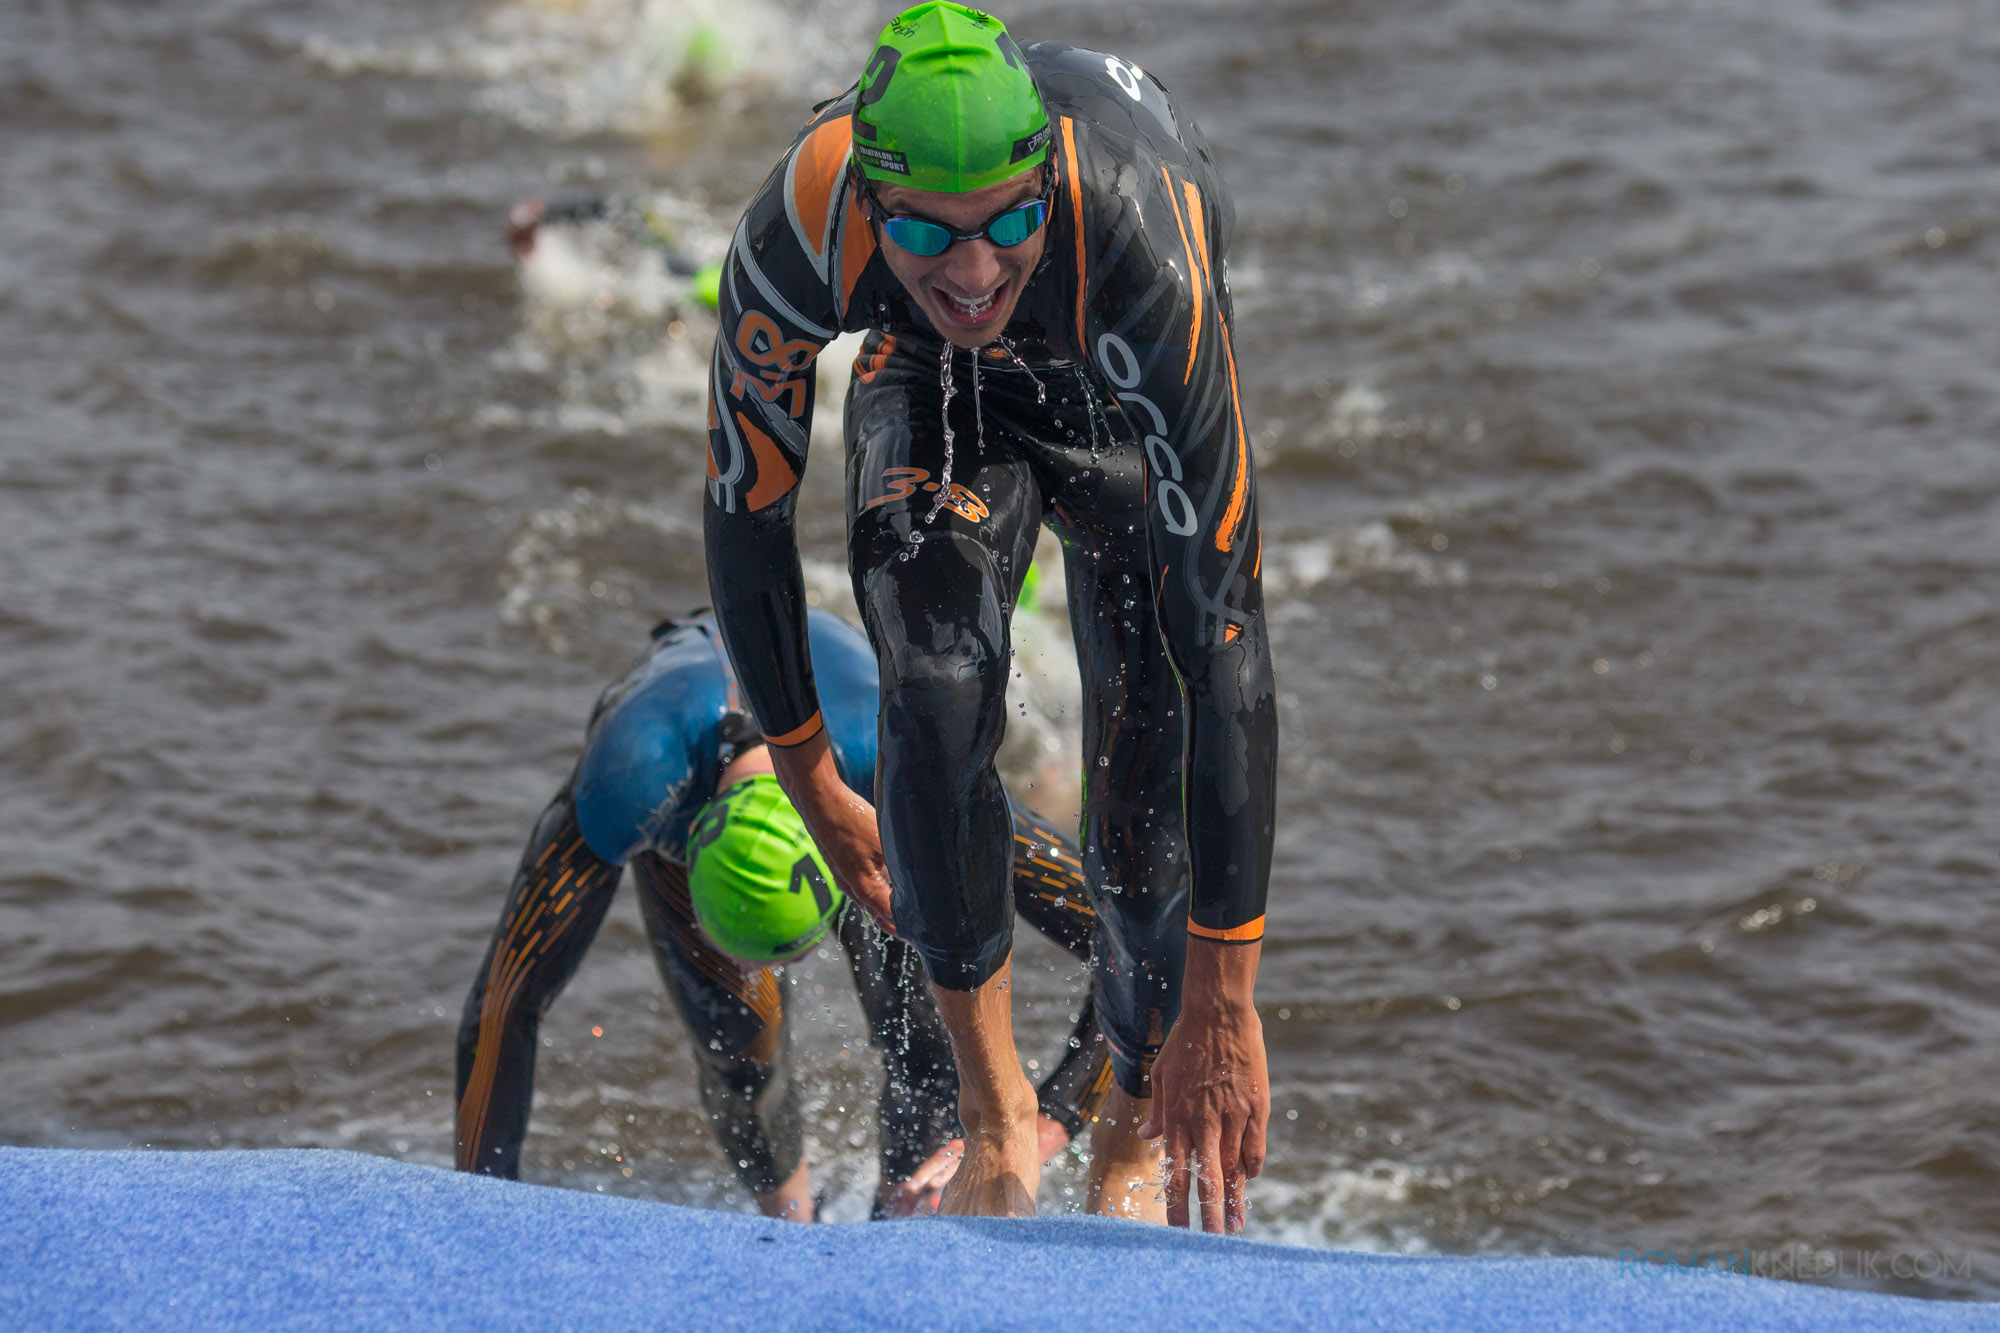 ICU_World_Cup_Triathlon_KV-34